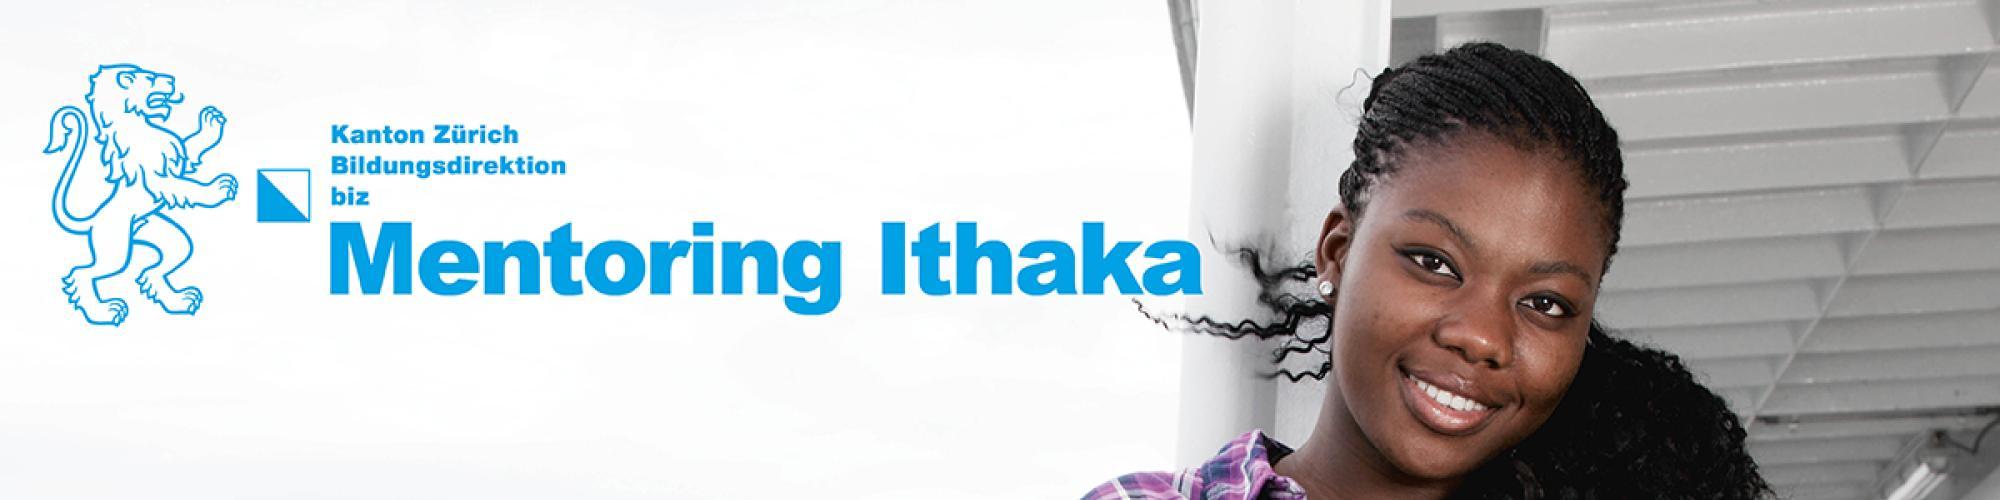 Mentoring Ithaka